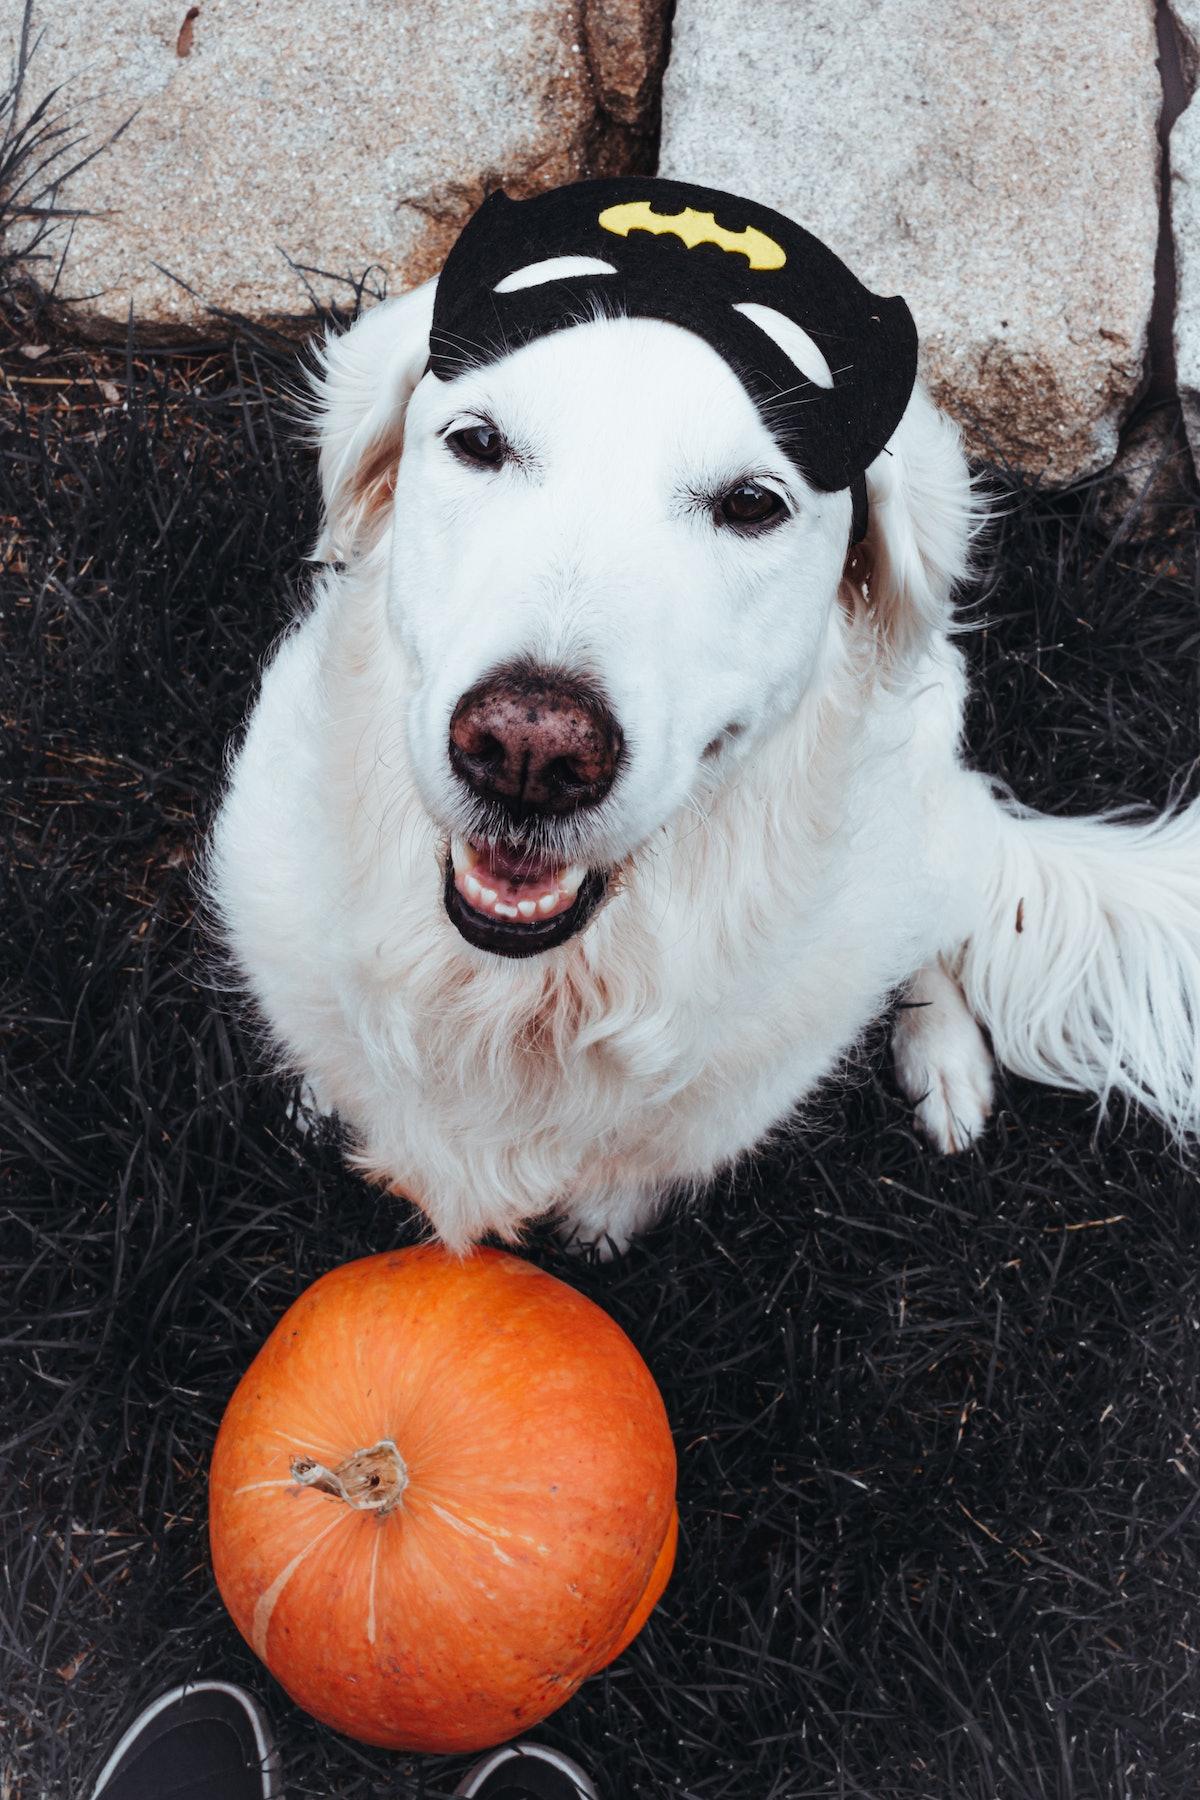 A golden retriever poses next to a pumpkin while wearing a Batman mask on Halloween.